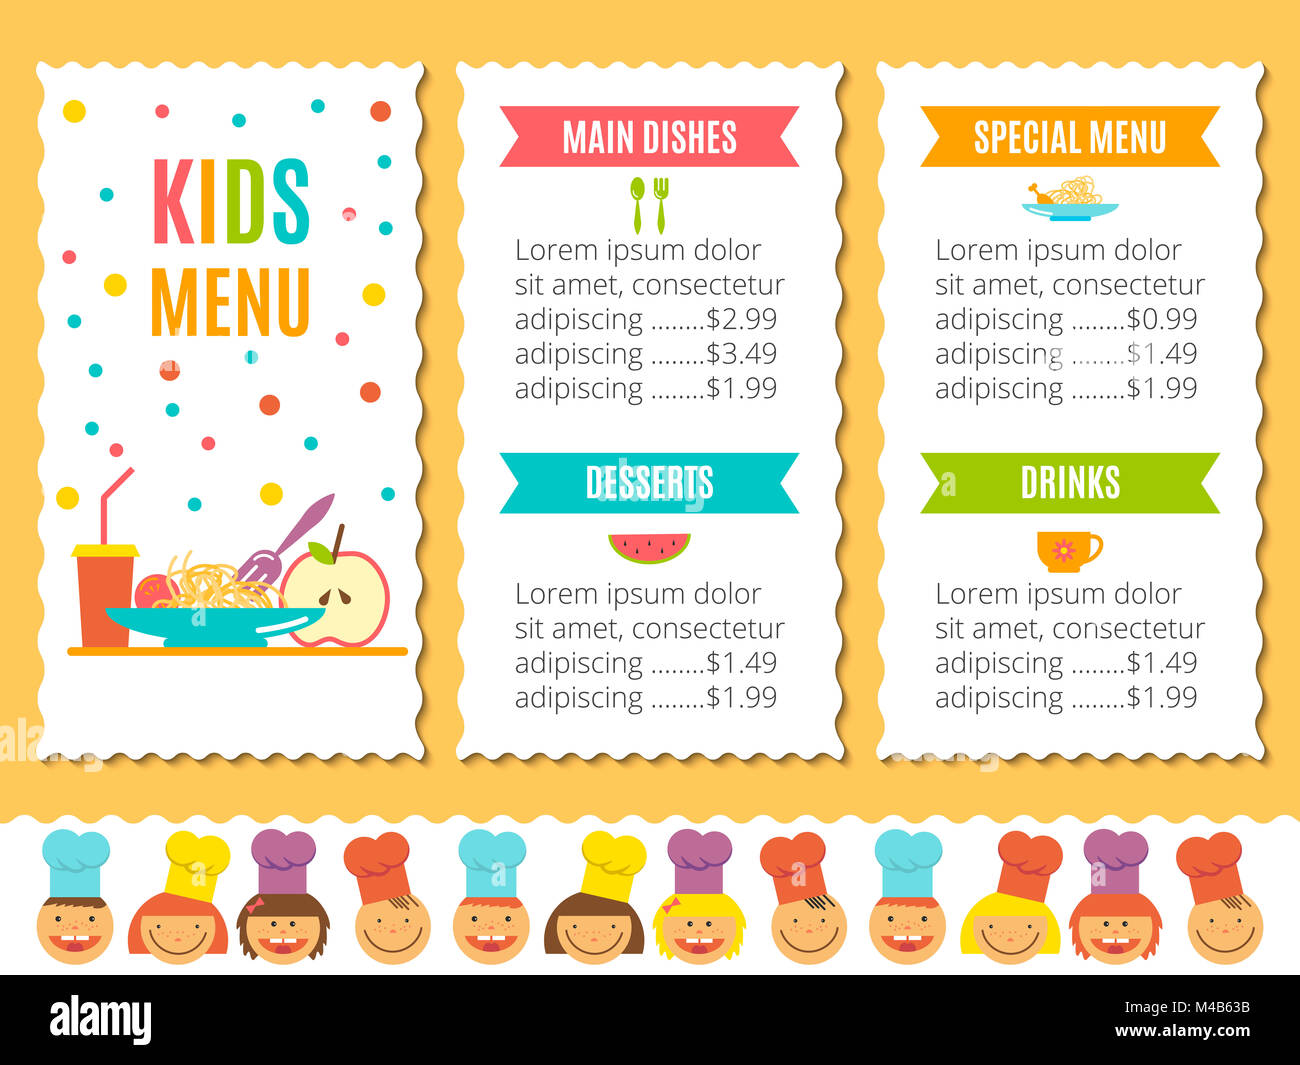 Kids Menu Template Stock Photo 174808575